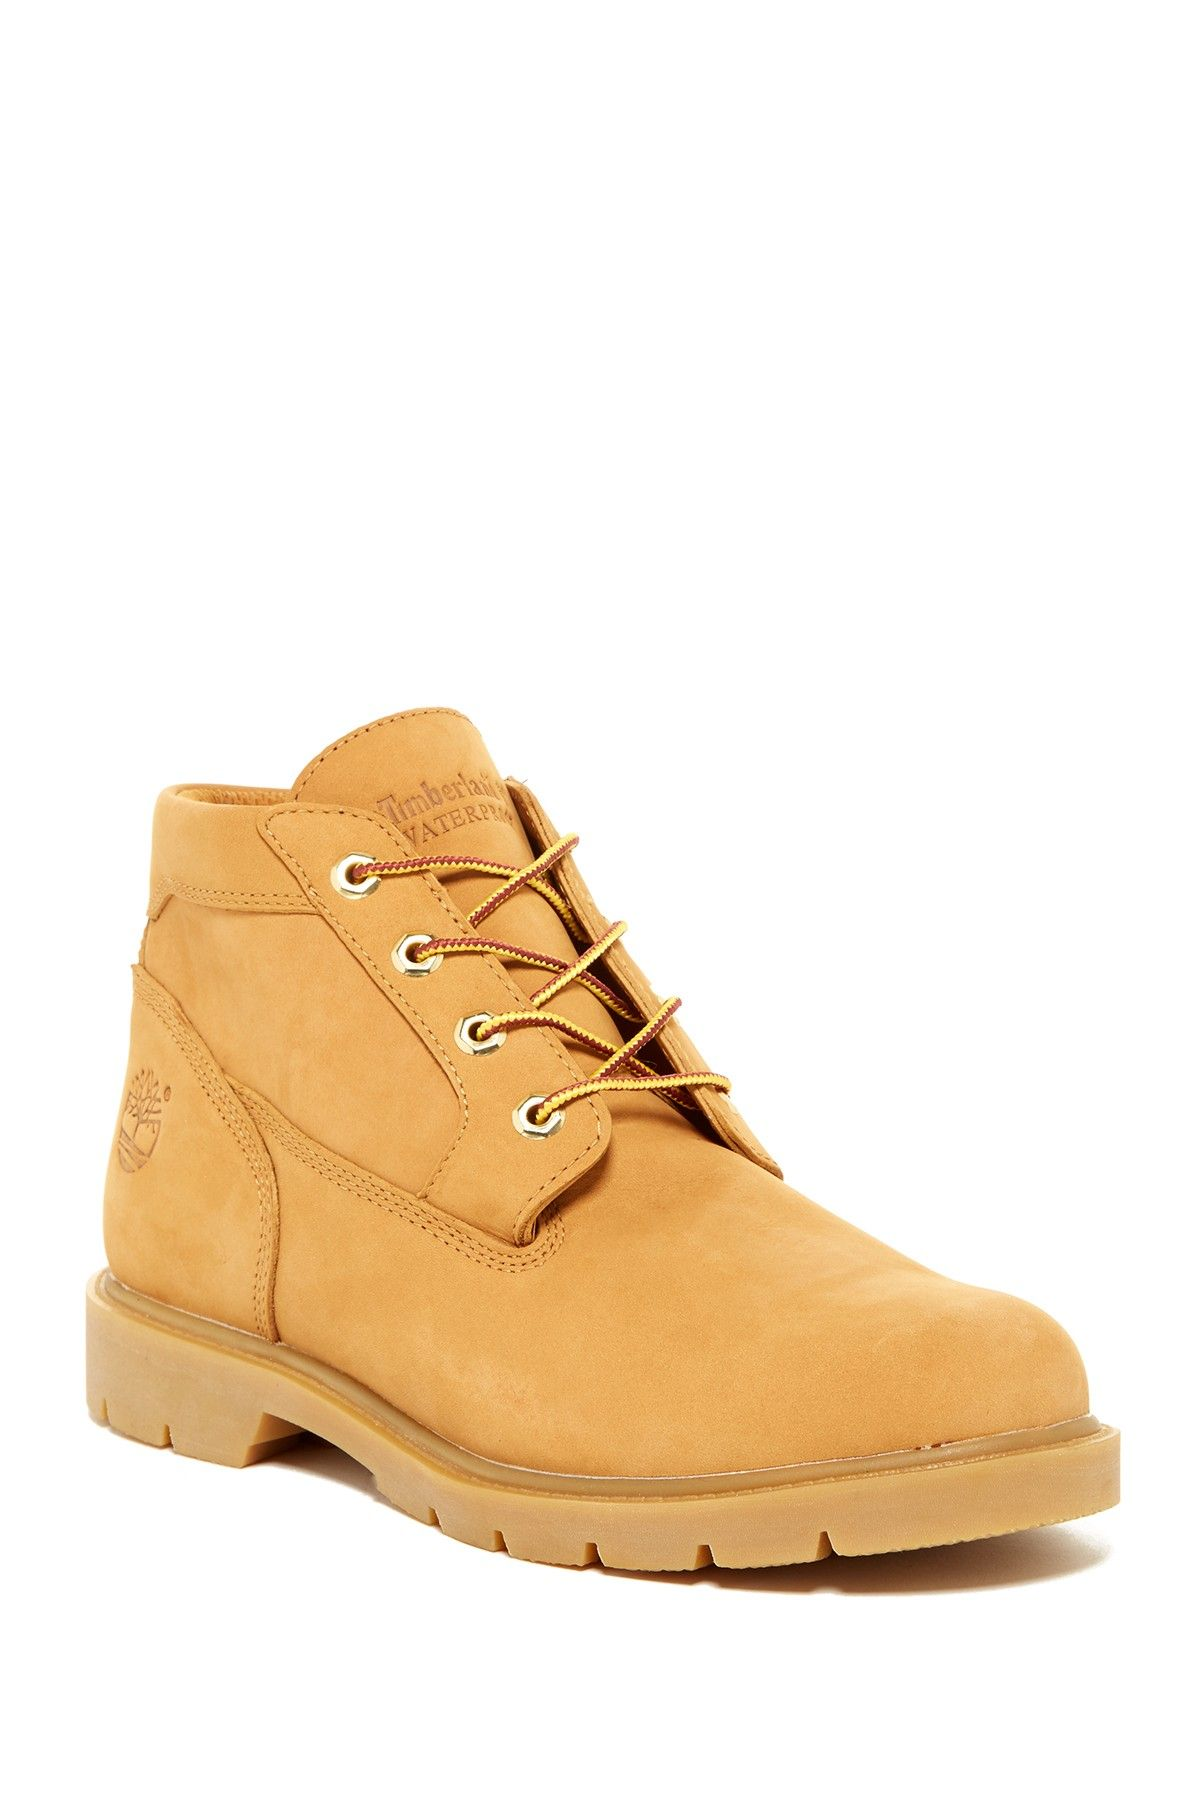 Classic Waterproof Leather Chukka Boot